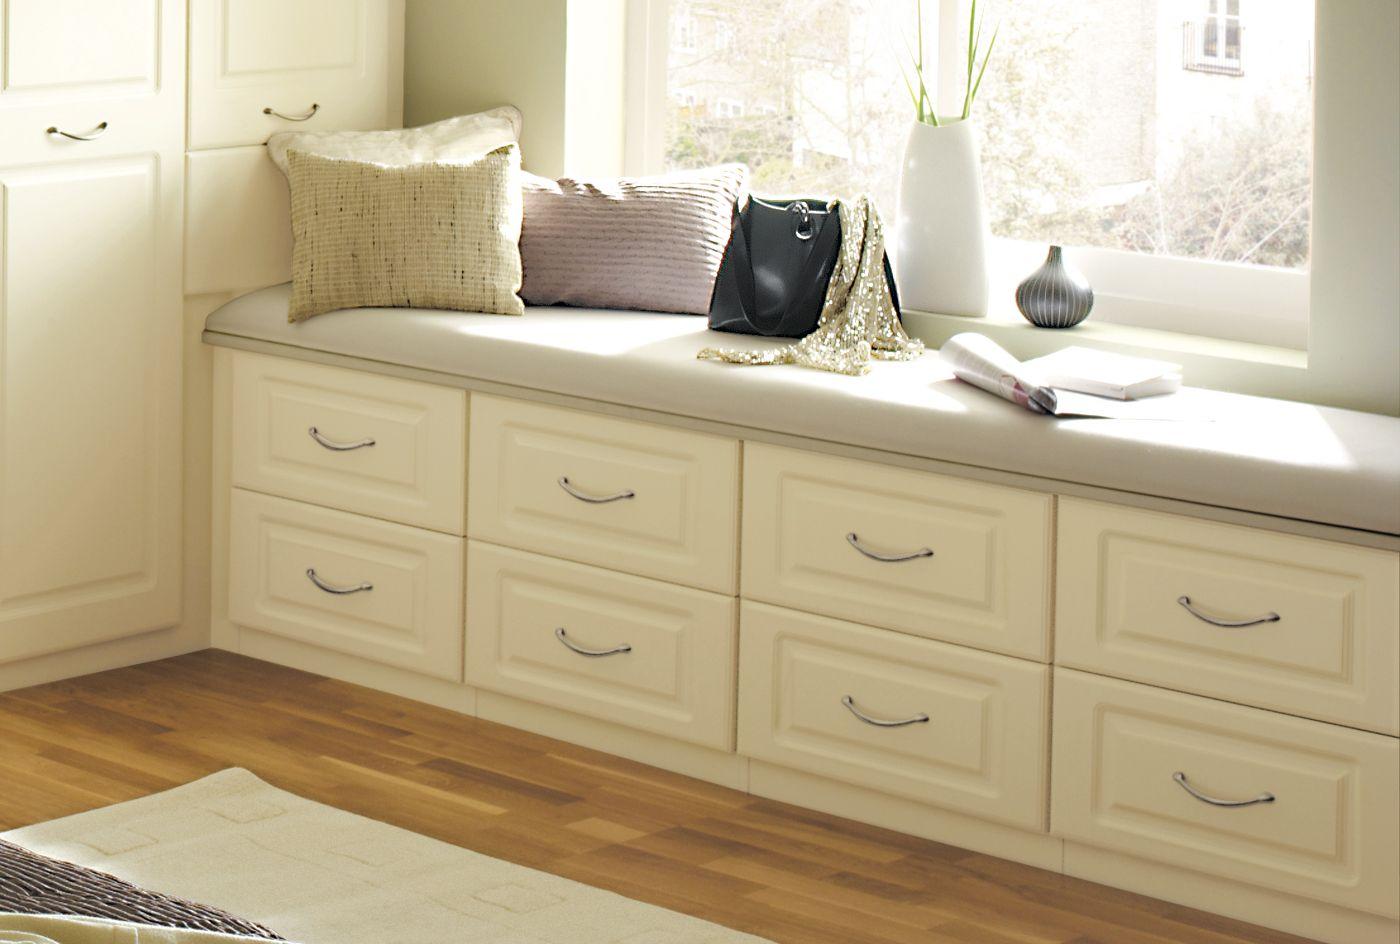 cream bedroom furniture white wardrobe and cream bedrooms on pinterest bedroom celio furniture cosy